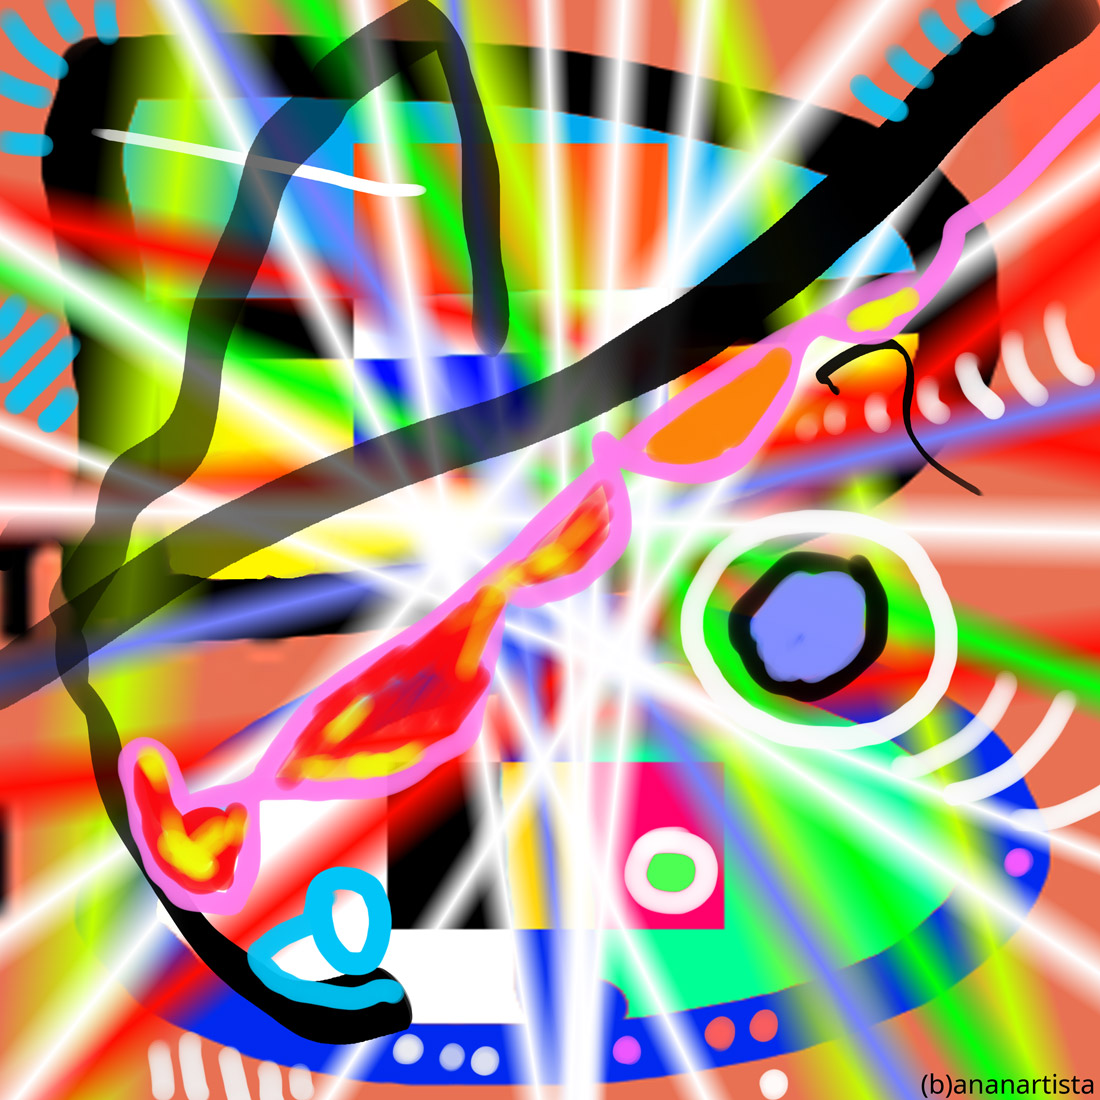 objekten fascinans dna dasein: abstract digital art by (b)ananartista sbuff